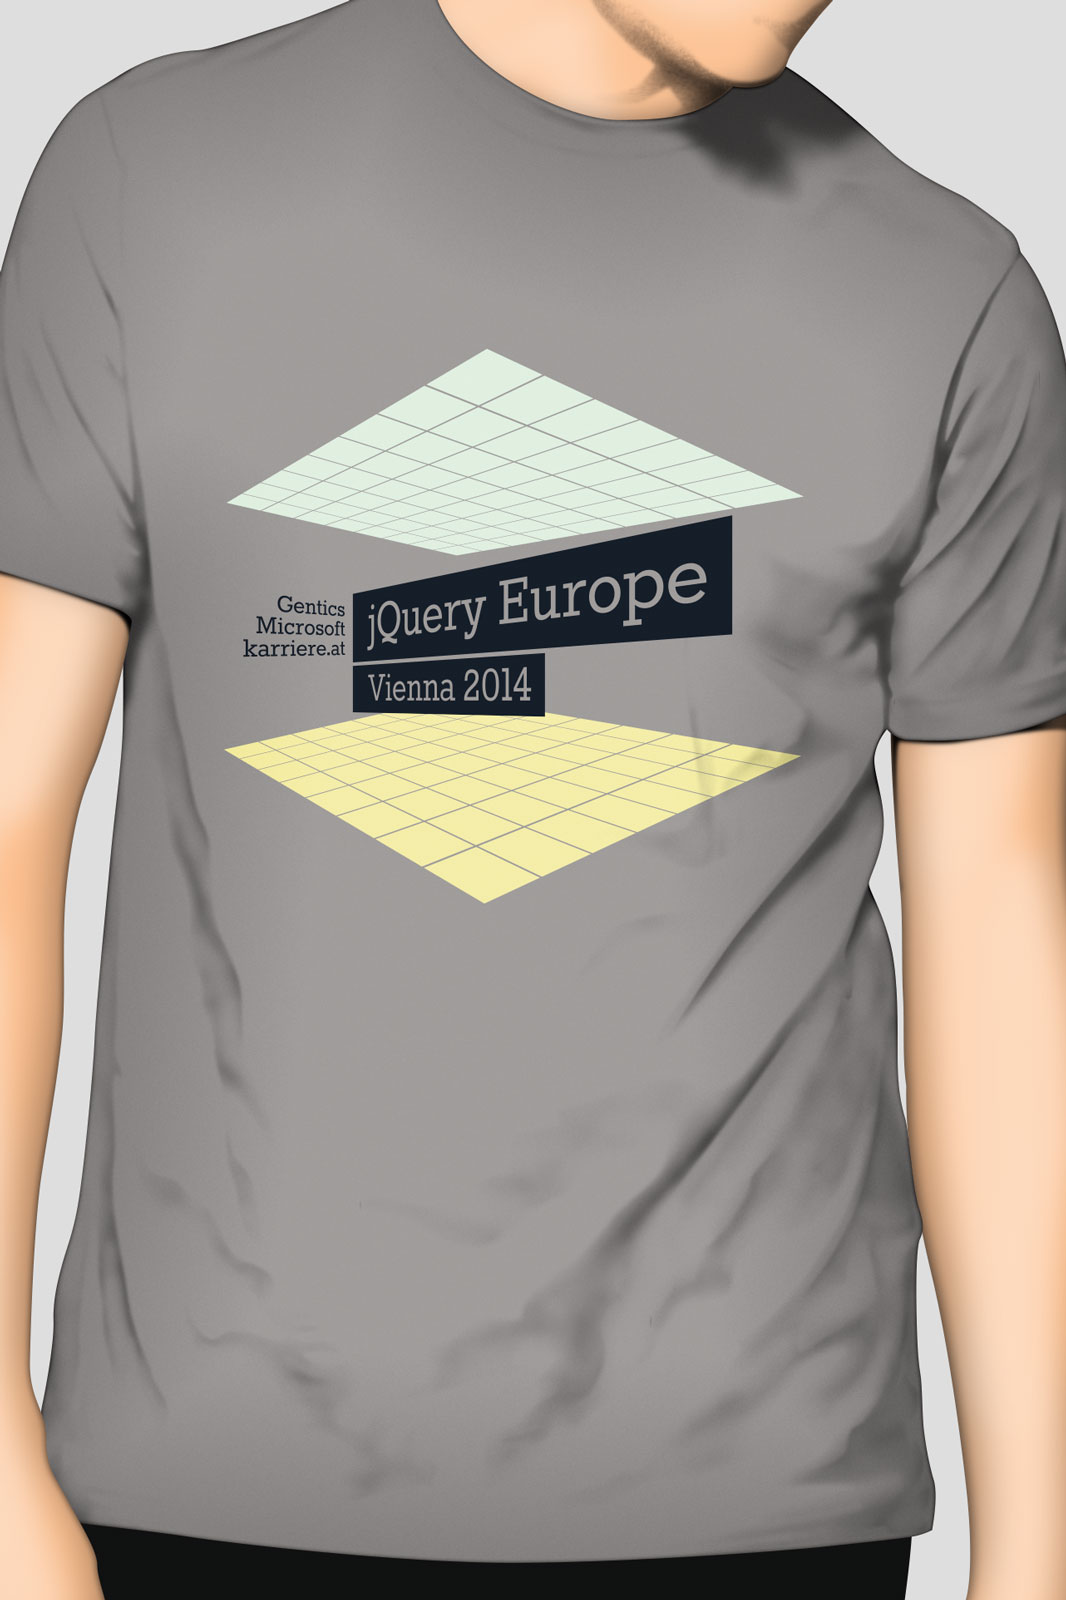 J Query Europe Shirt 2